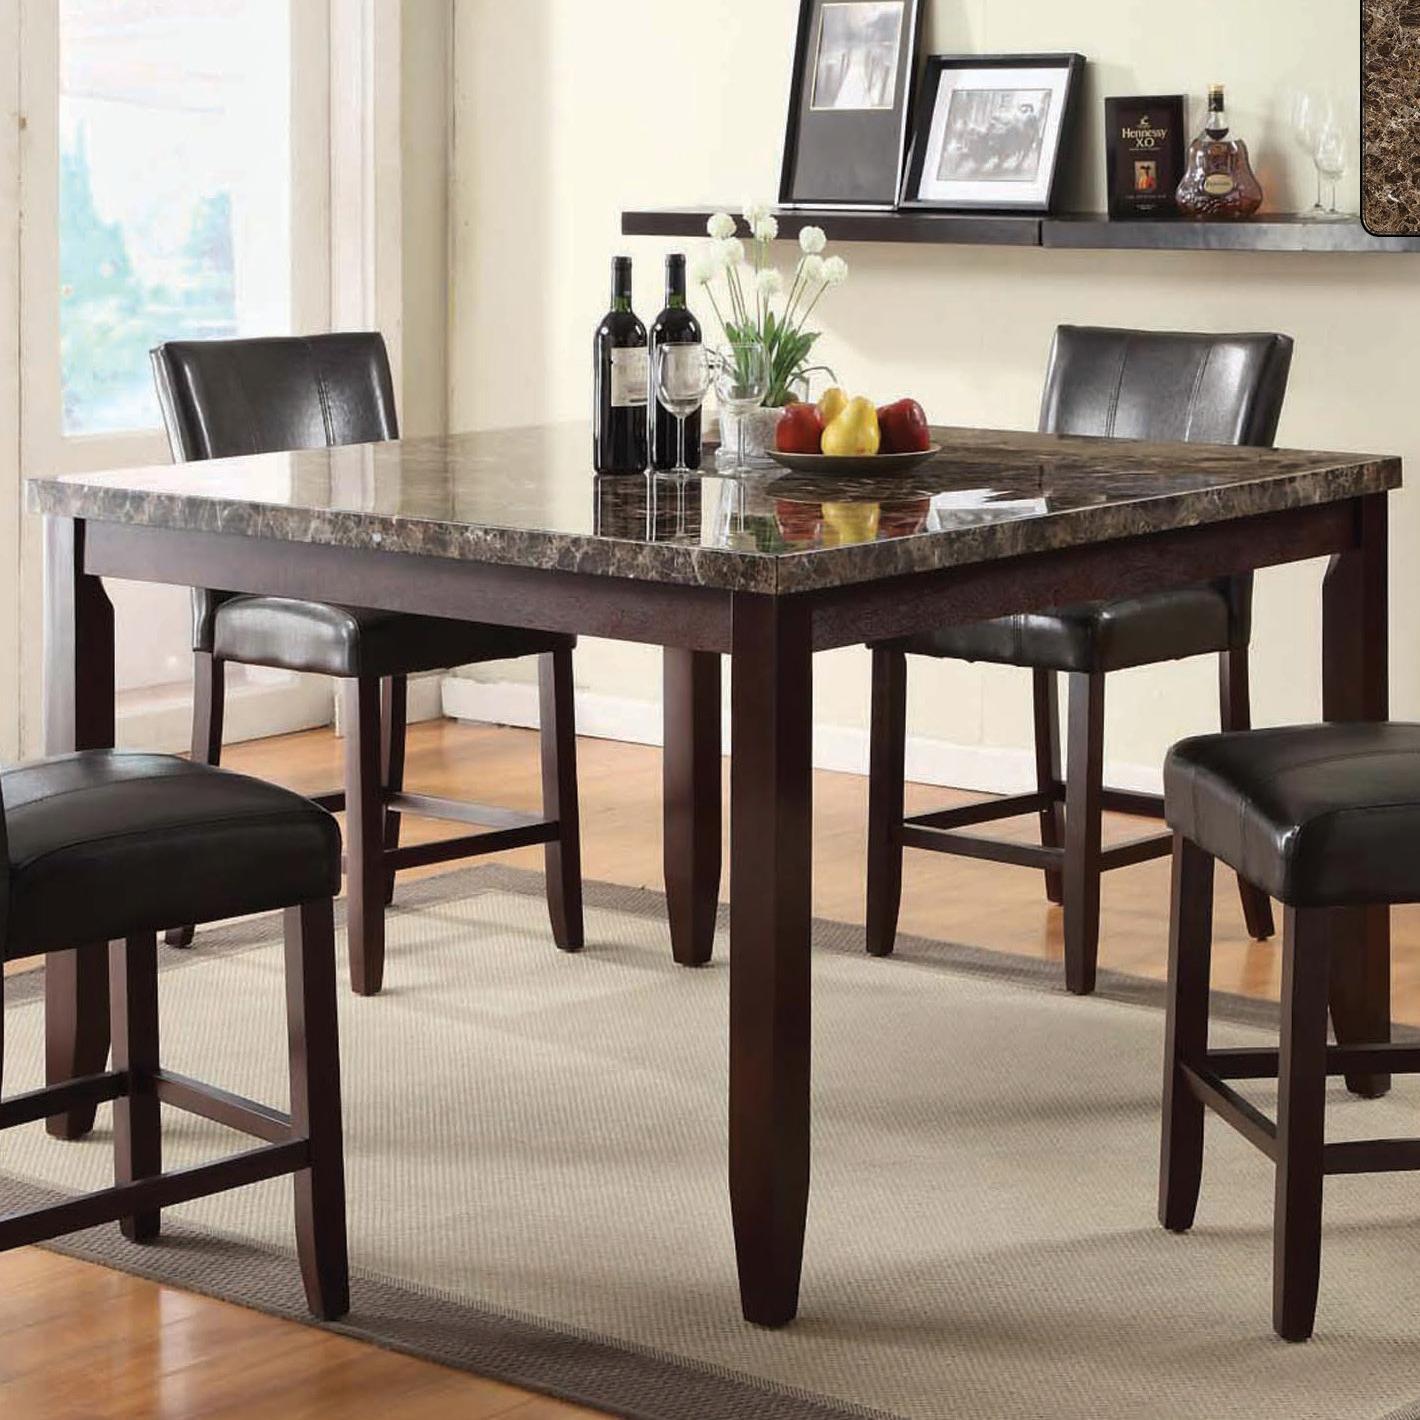 U S Furniture Inc 2720 Dinette Transitional Counter